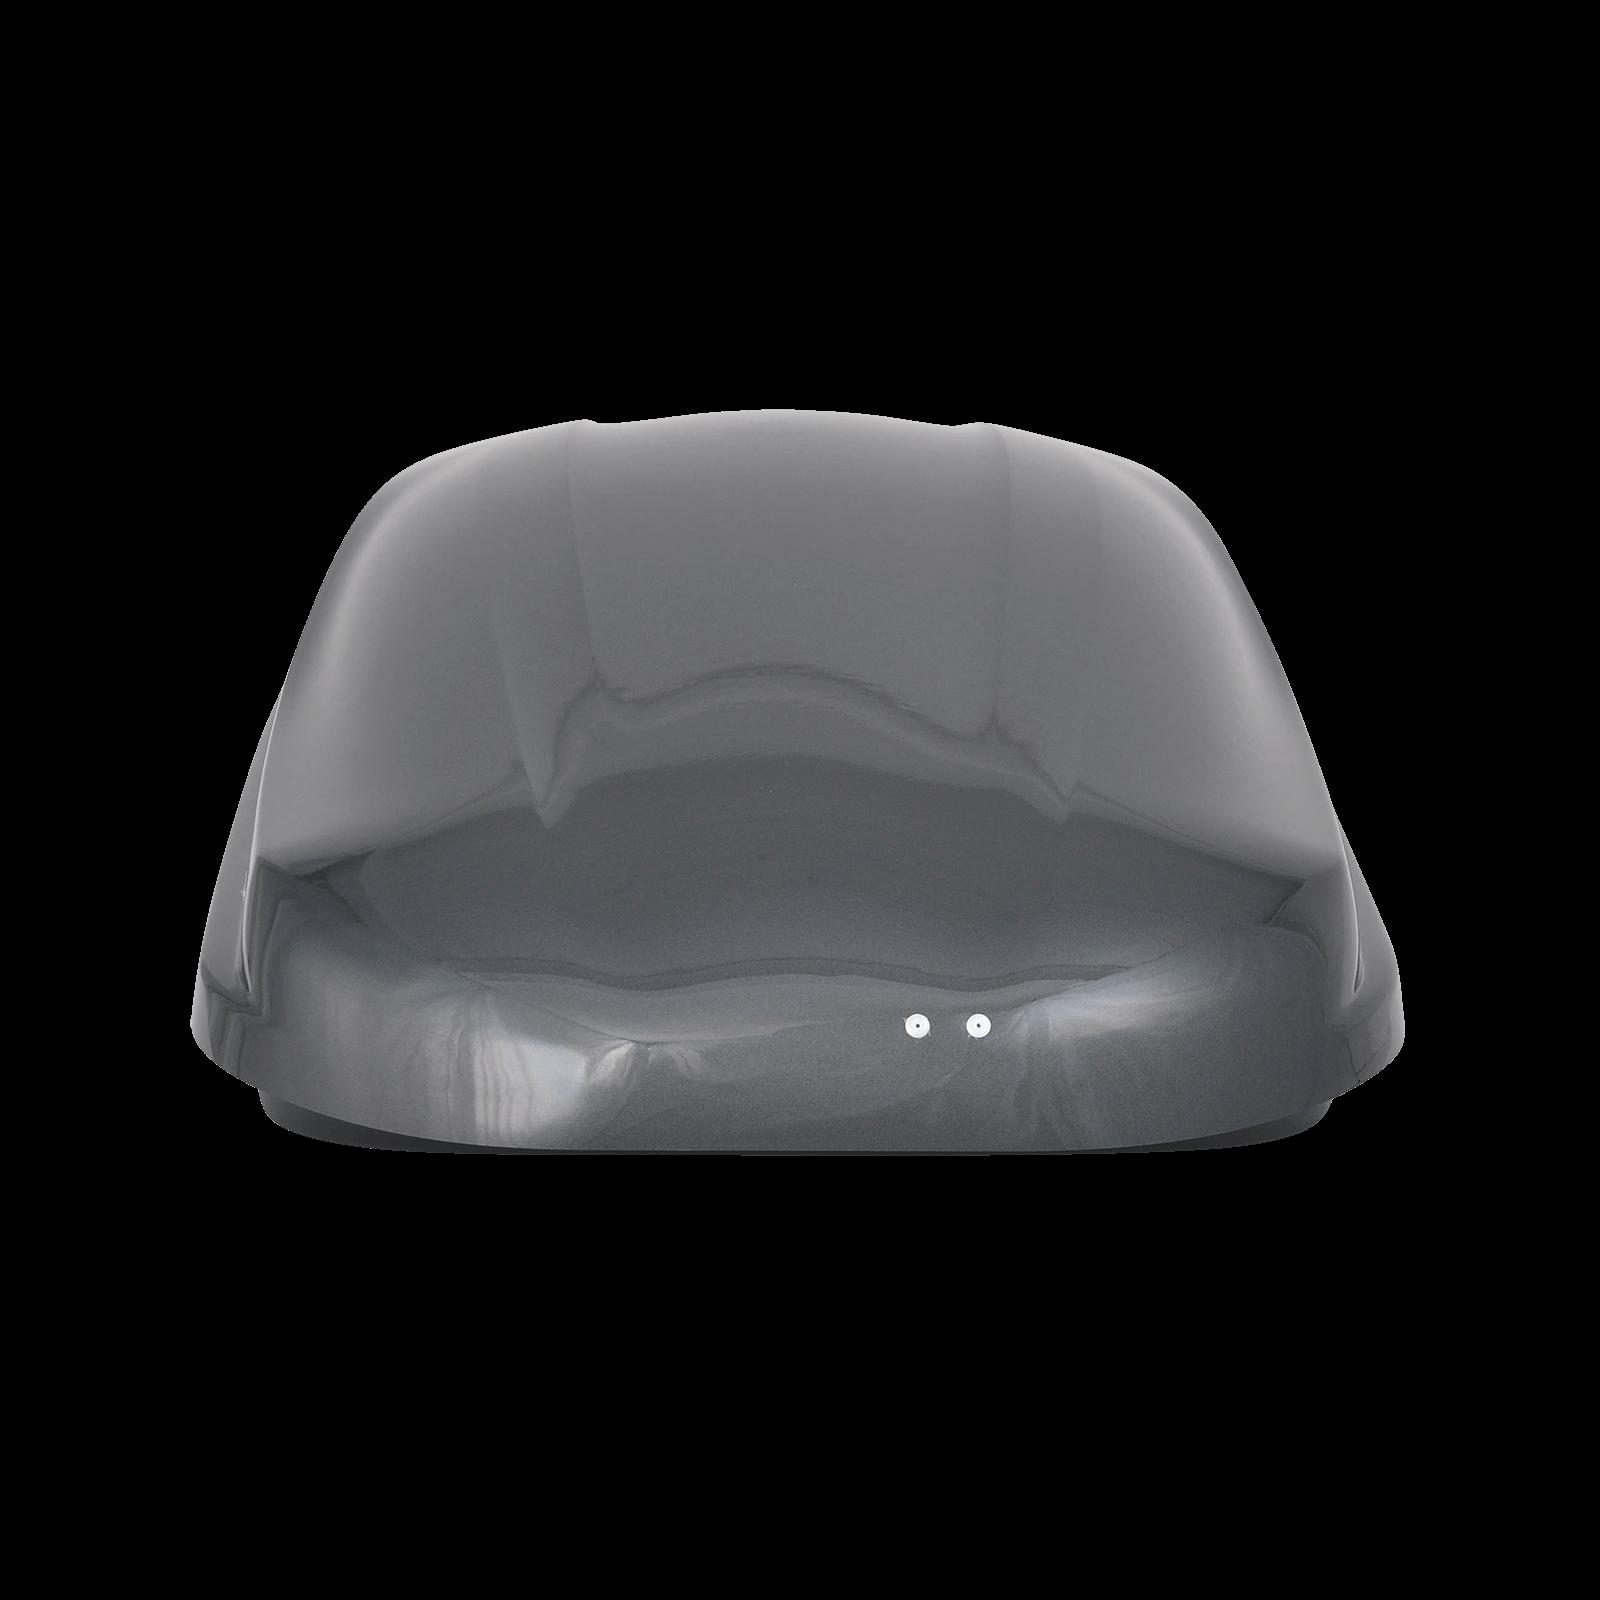 Dachbox Junior Altro 370 grau glänzend - Bild 3